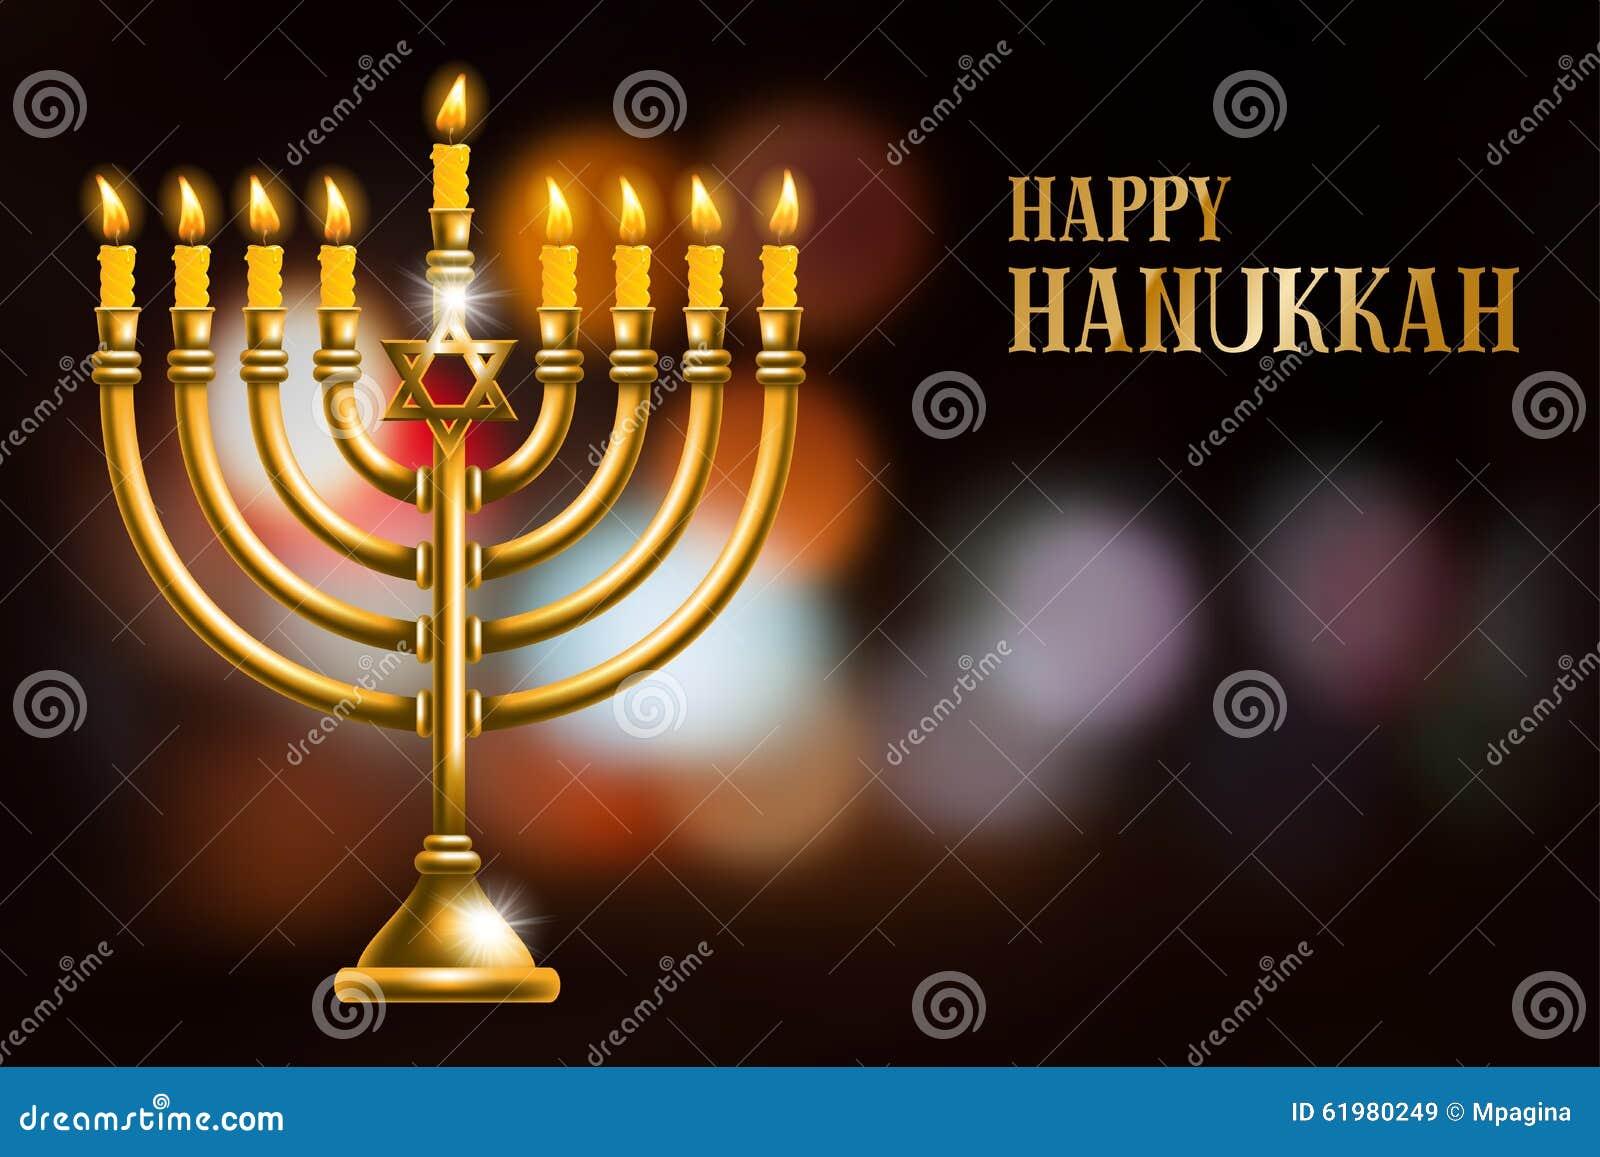 Hanukkah Greeting Cards >> Happy Hanukkah Stock Vector - Image: 61980249